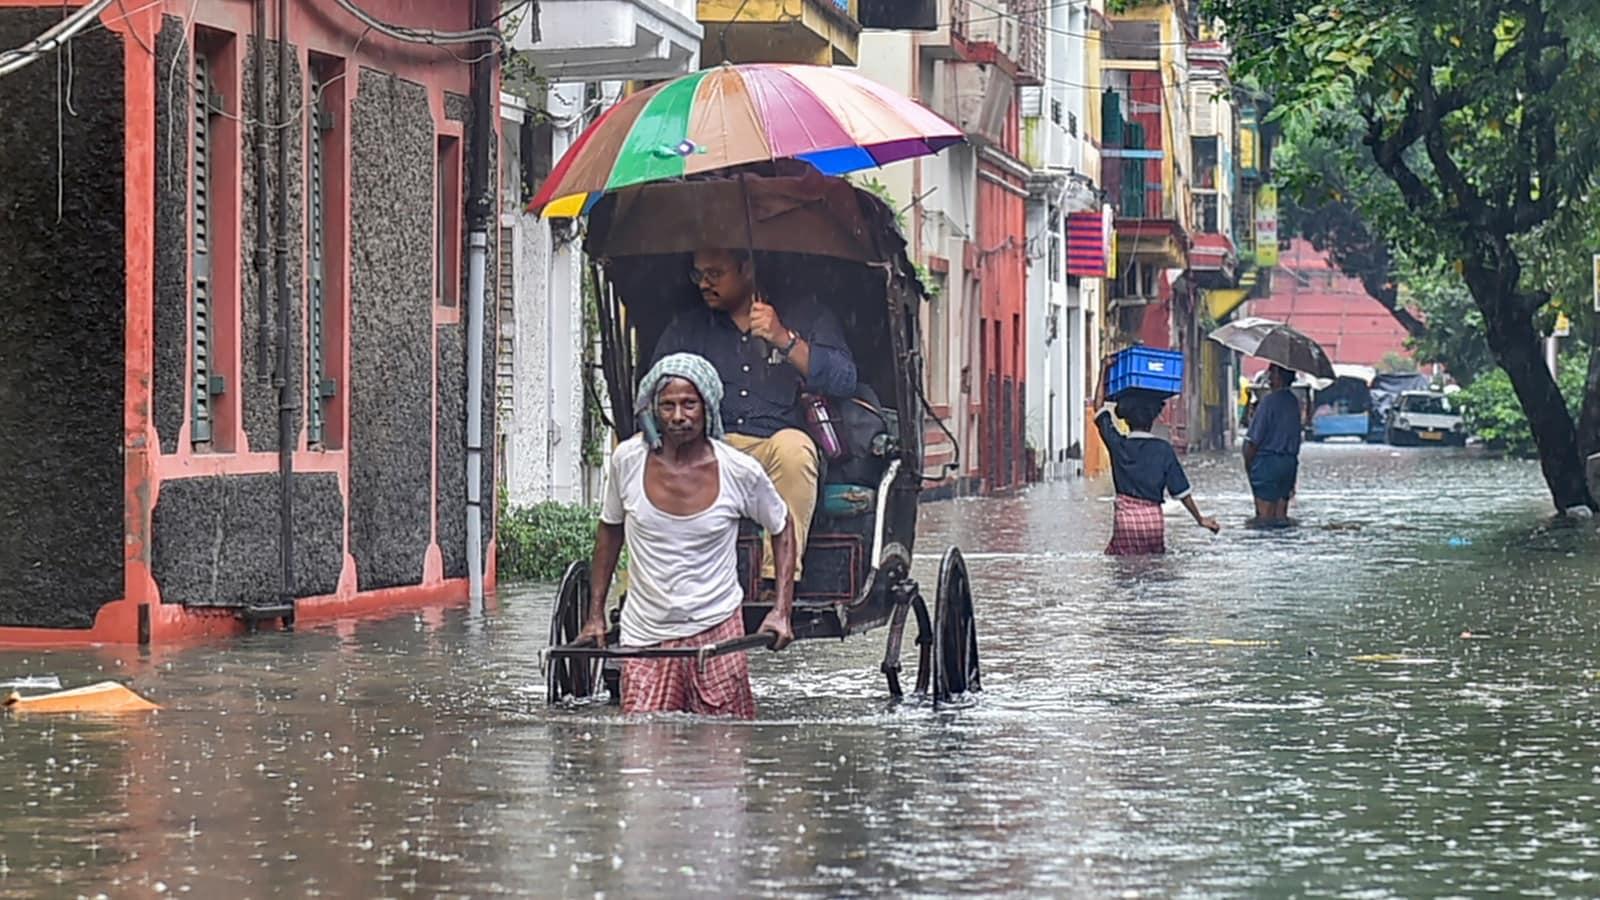 Kolkata rain: Several areas under water, highest September rainfall since 2007